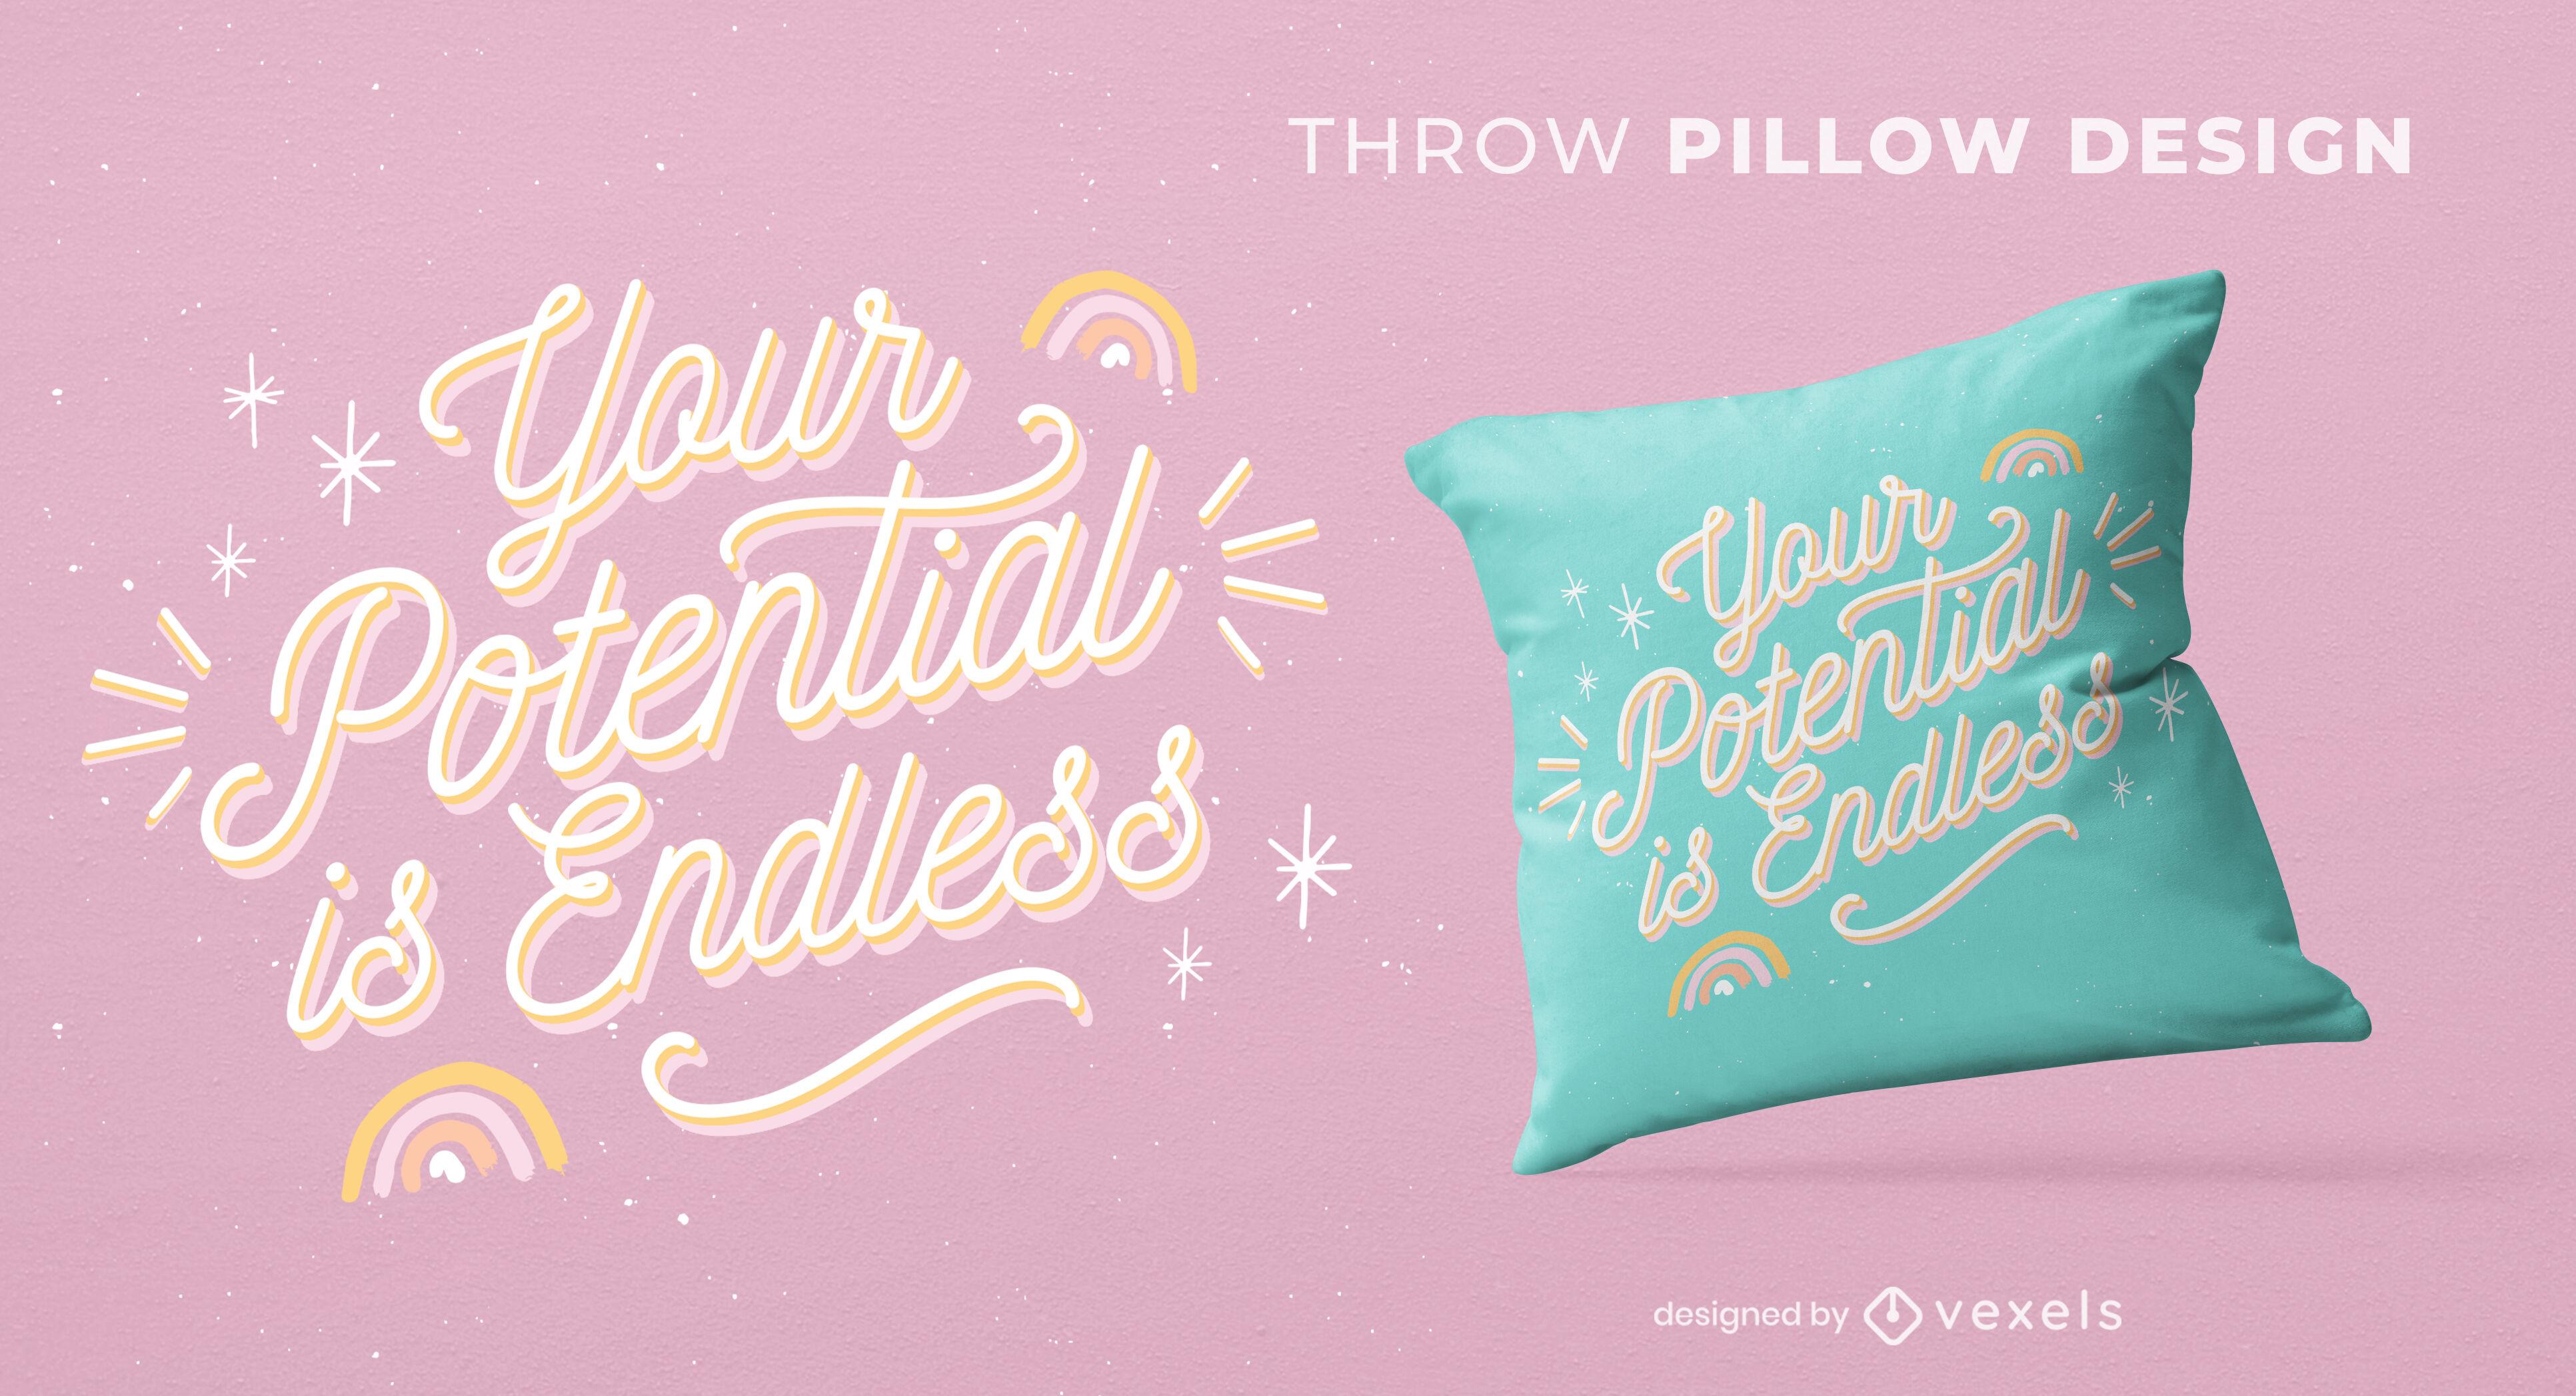 Diseño lindo de la almohada del tiro de la cita motivacional